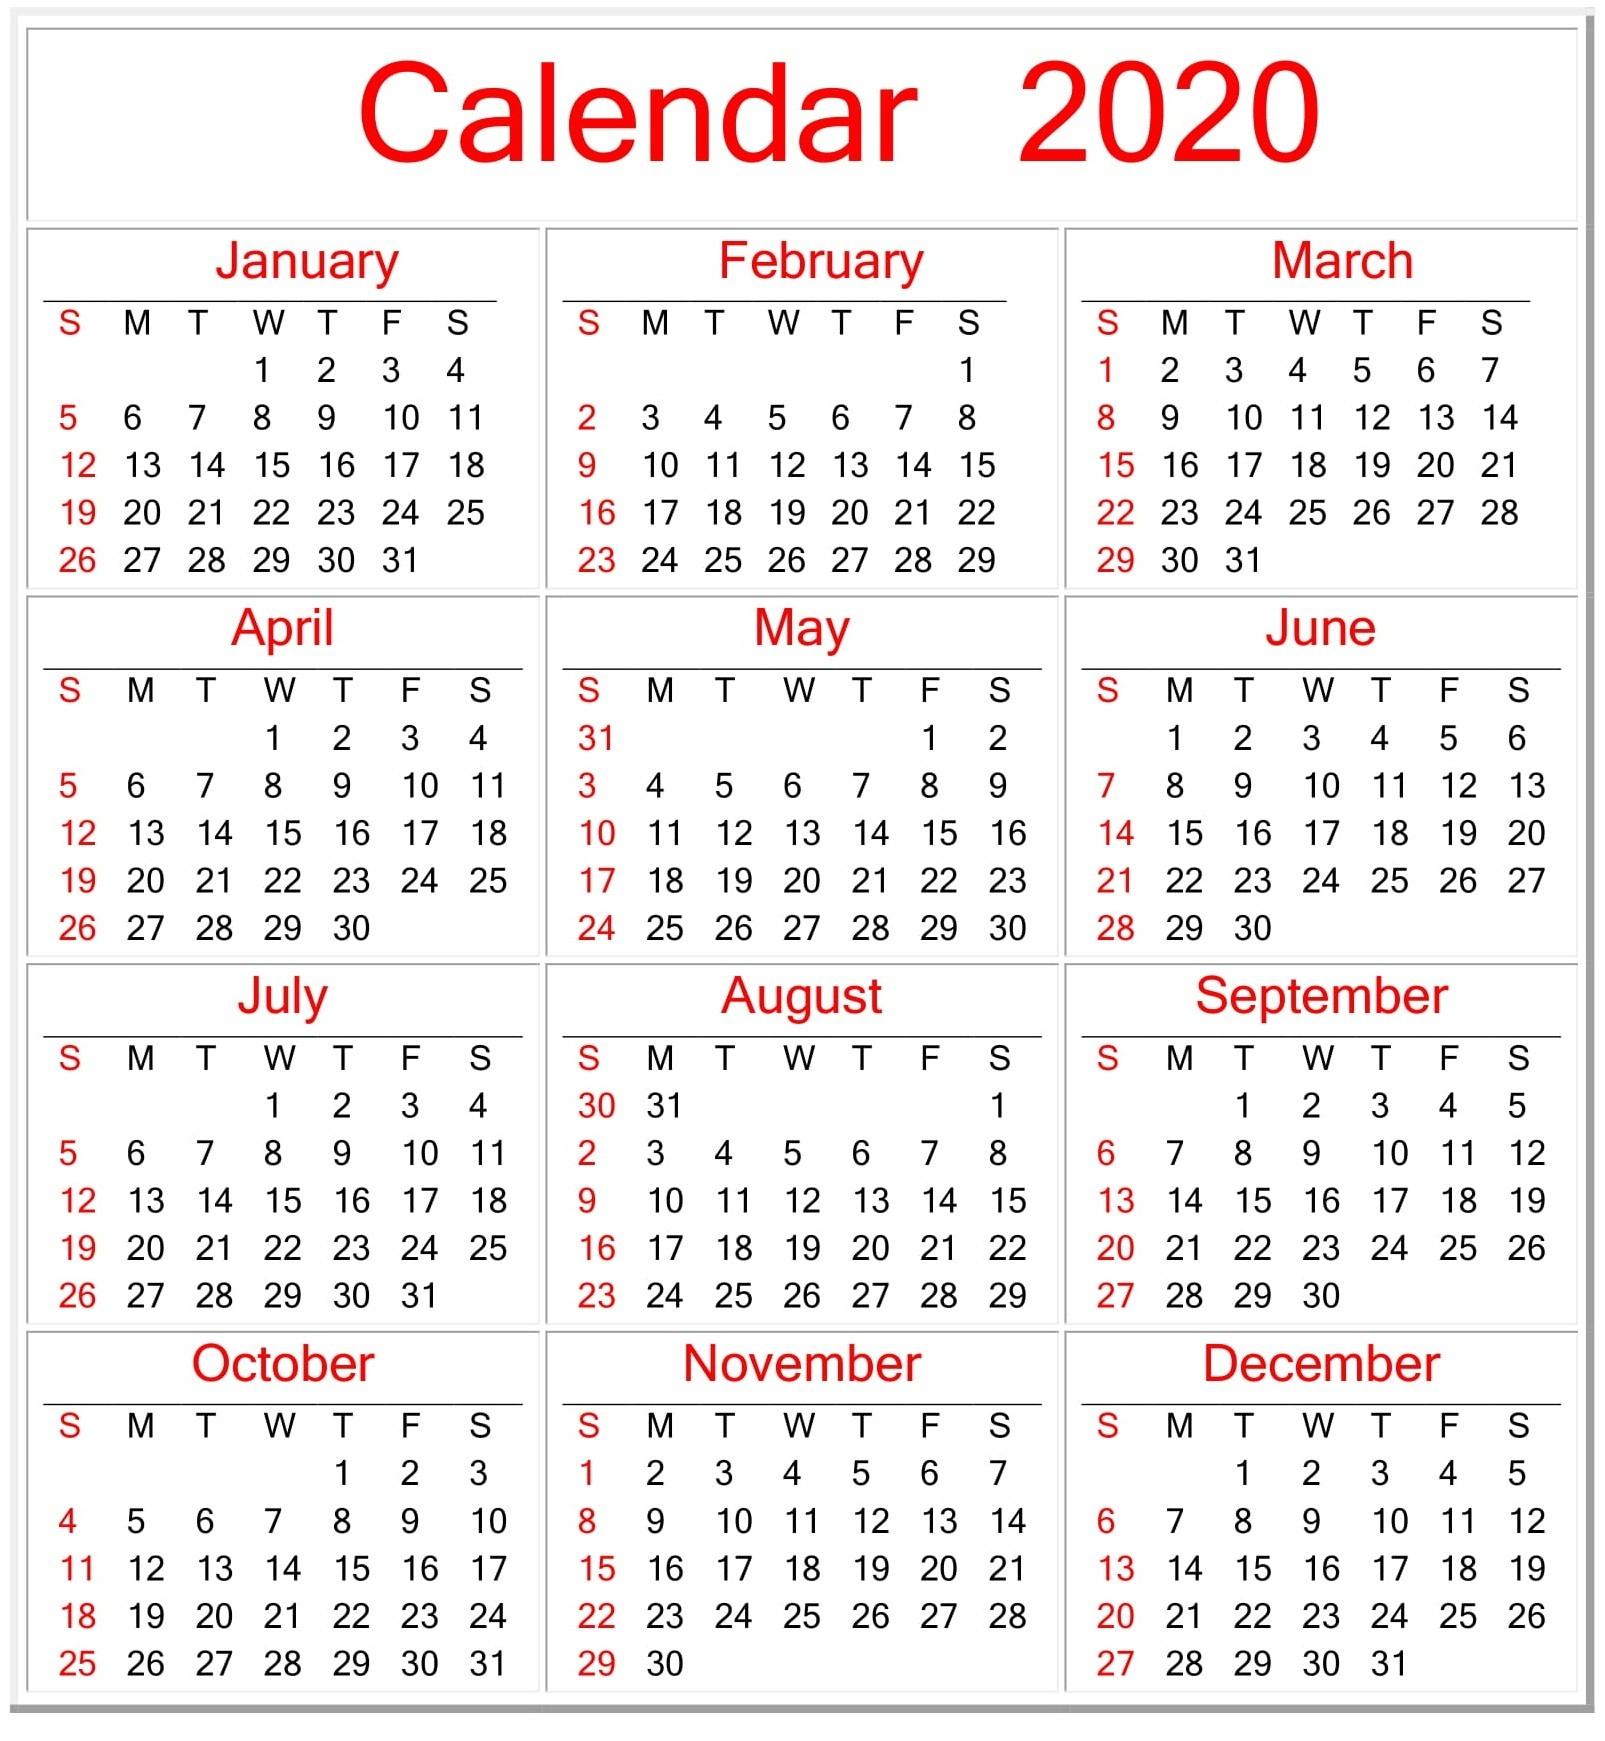 Printable Calendar 2020 Pdf Template – Free Latest Calendar-Employee Vacation Calendar Template 2020 Printable Free